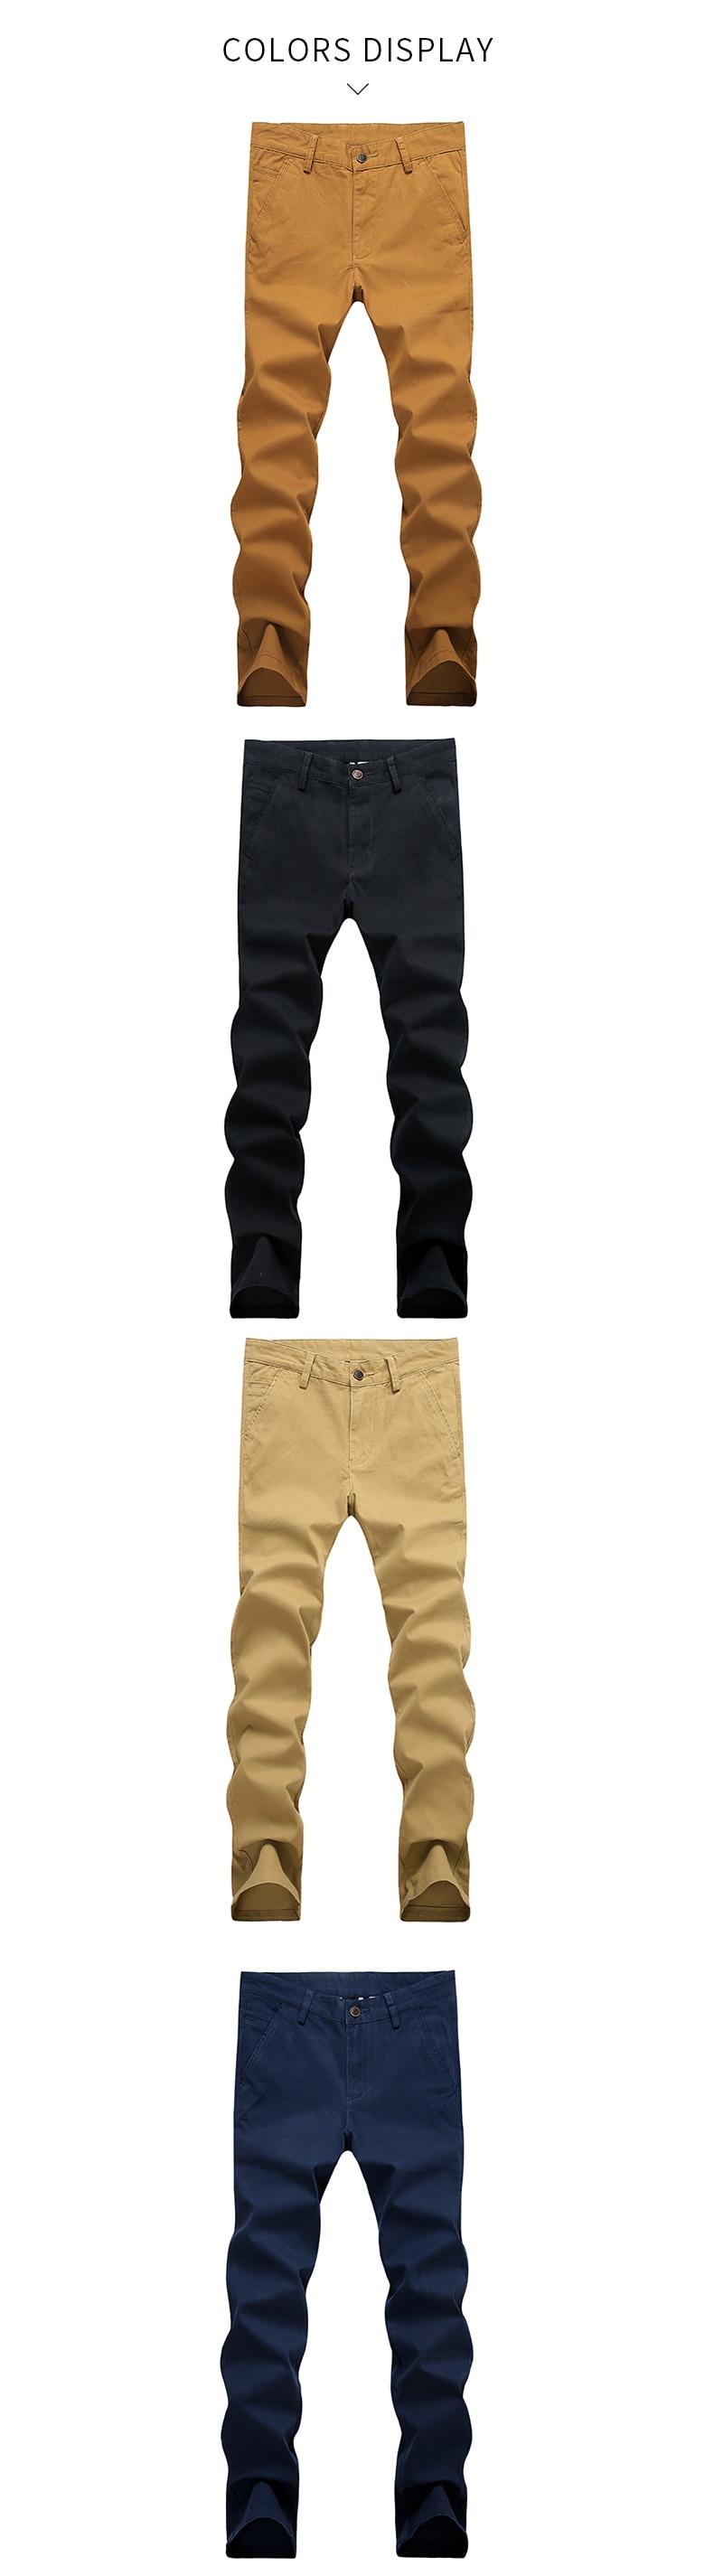 HTB1c1RCdMmTBuNjy1Xbq6yMrVXaL VOMINT Mens Pants High Quality Cotton Casual Pants Stretch male trousers man long Straight 4 color Plus size pant suit 42 44 46